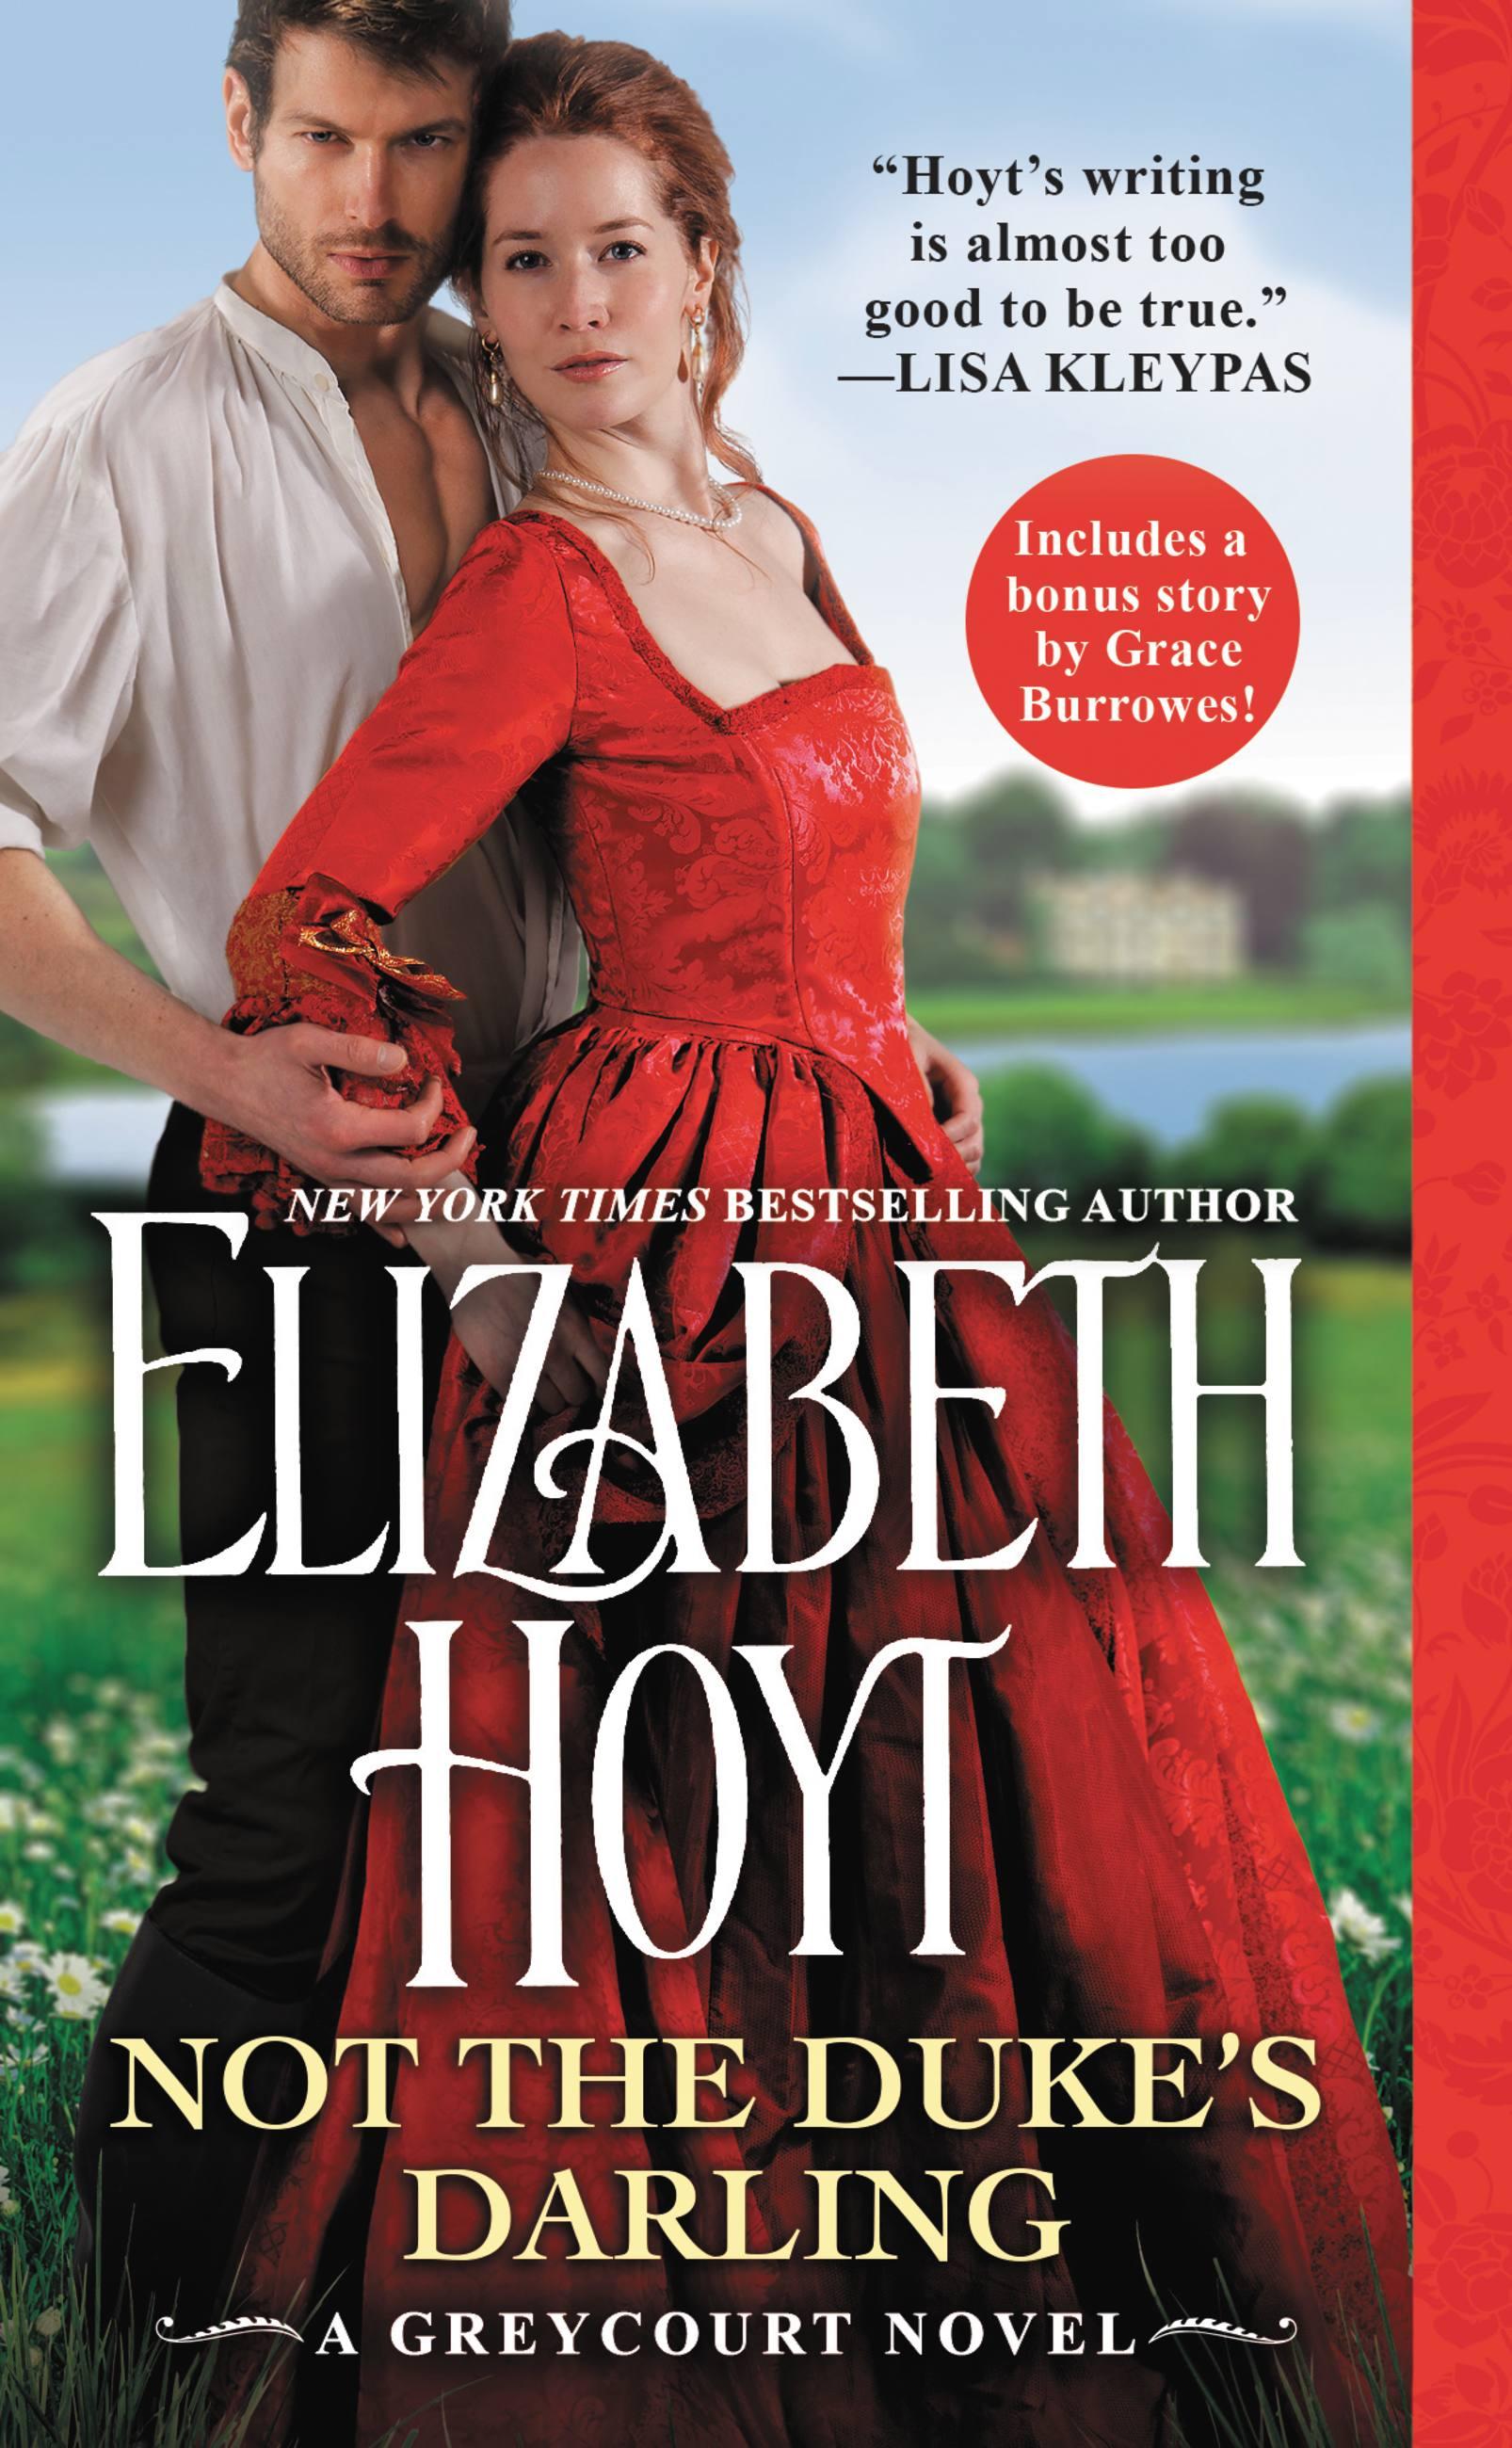 Not the Duke's Darling Includes a bonus novella